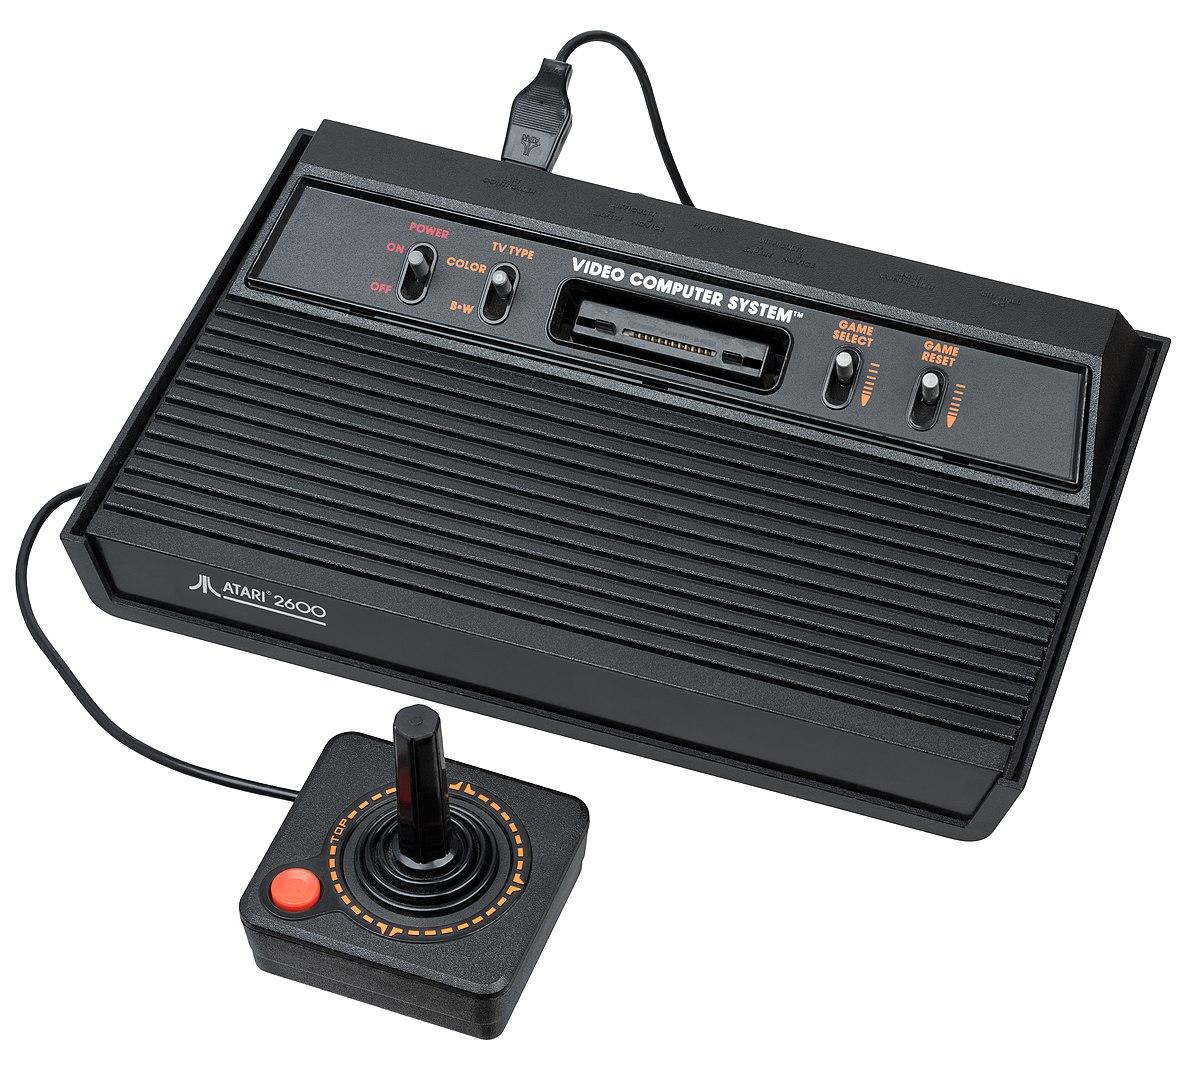 1200px-Atari-2600-Console.jpg